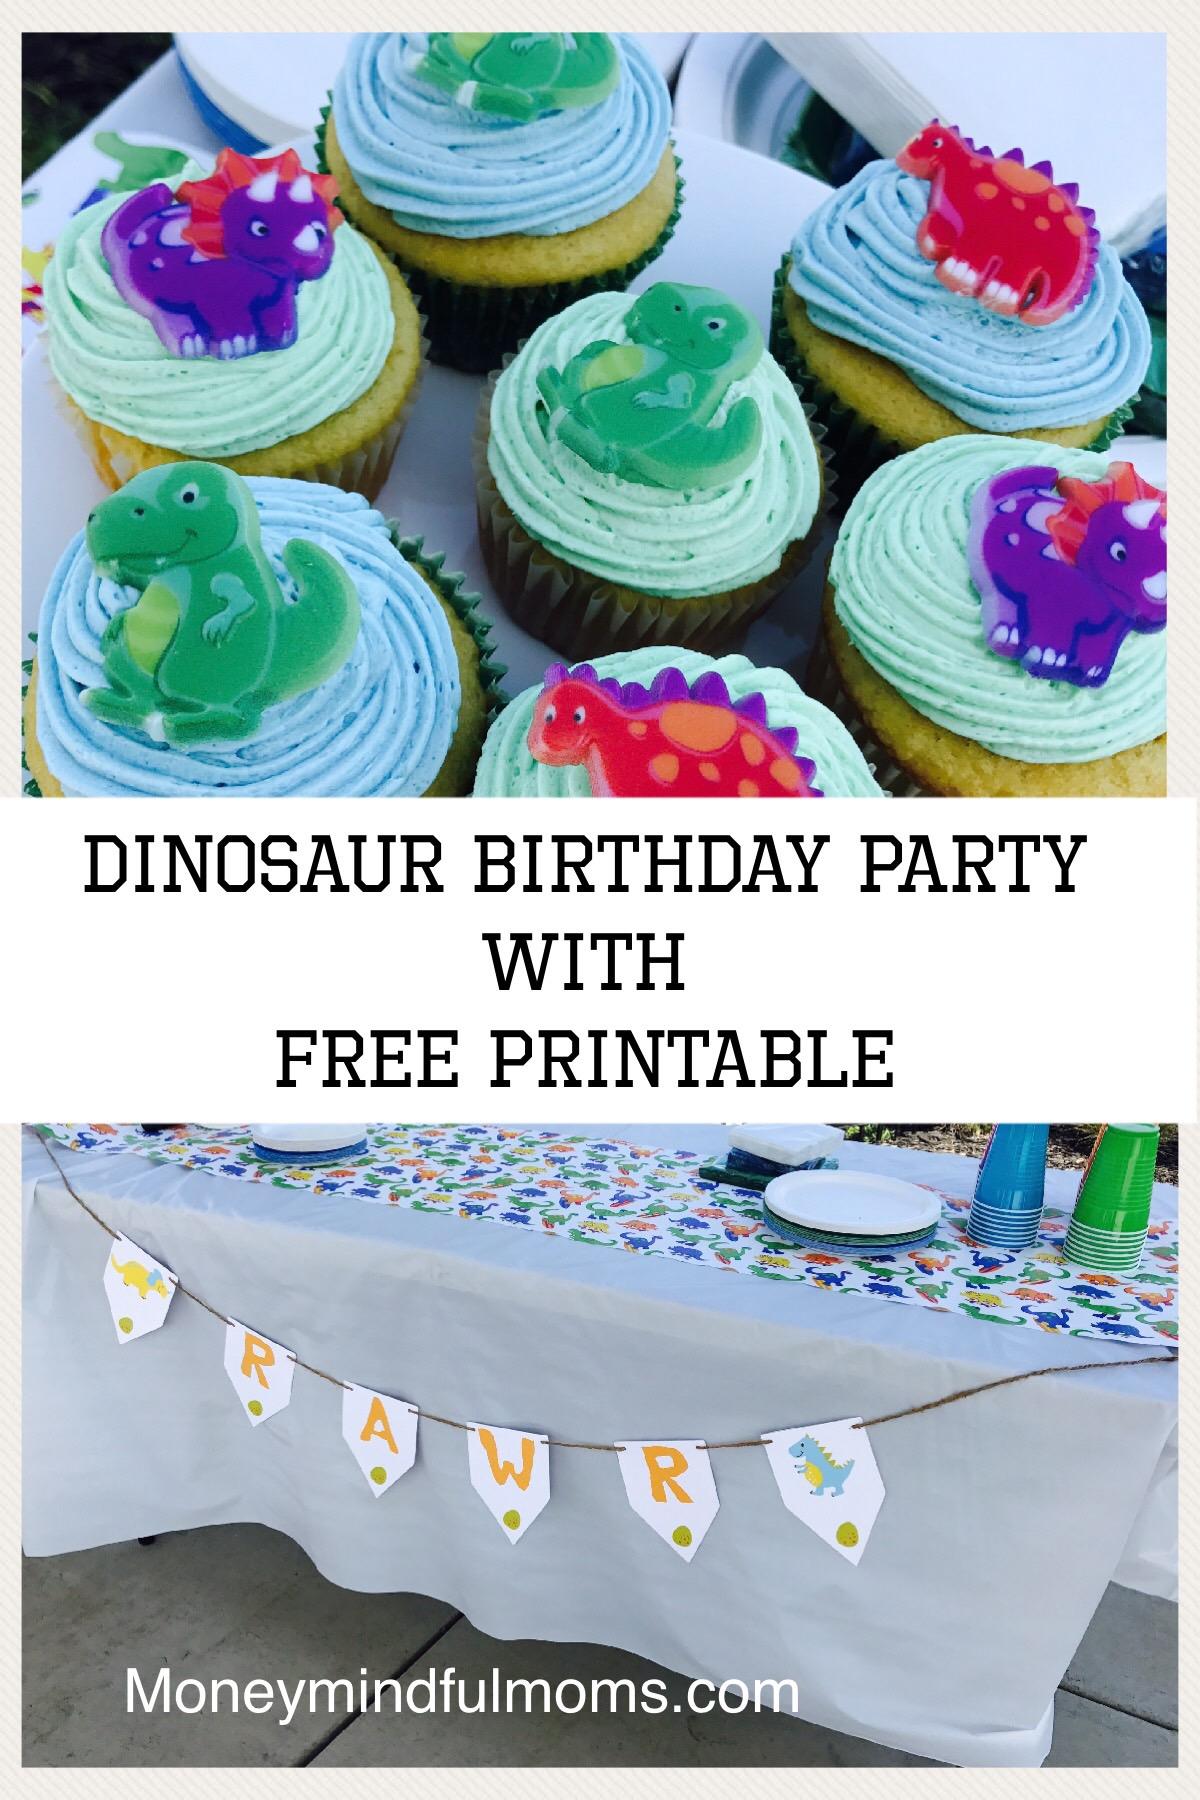 Dinosaur Birthday Party on a Budget